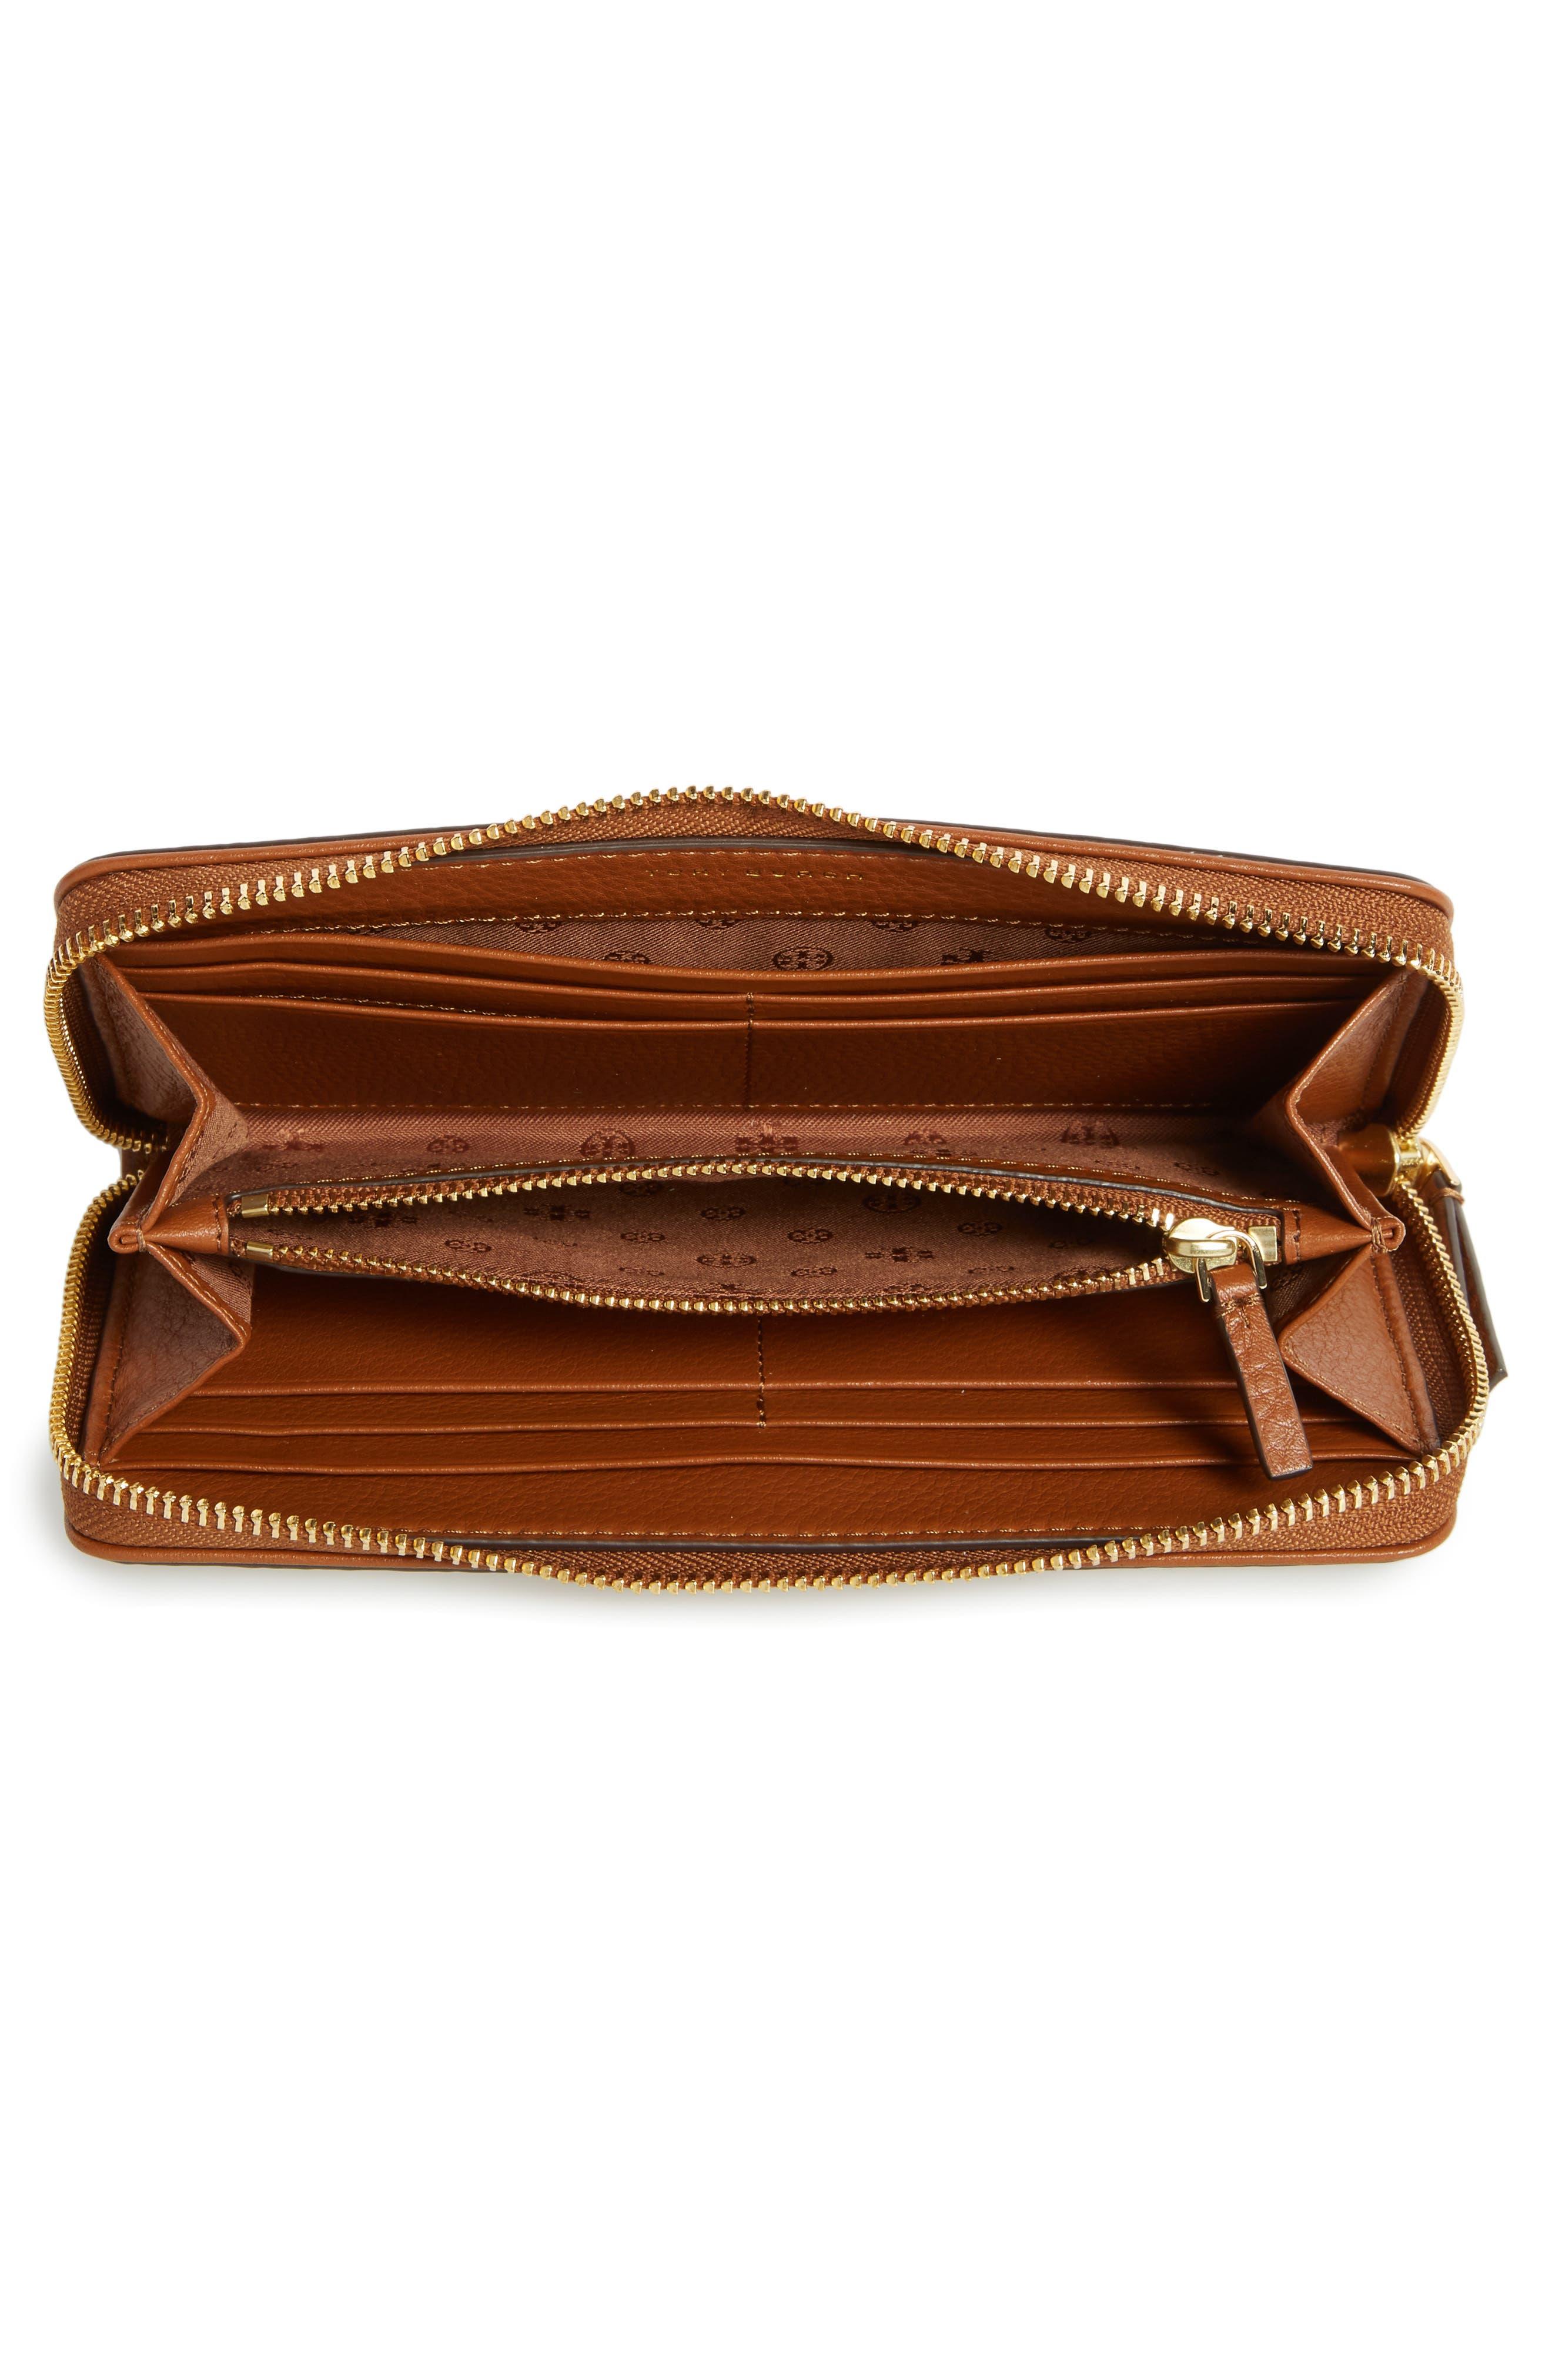 Marsden Leather Zip Around Wallet,                             Alternate thumbnail 11, color,